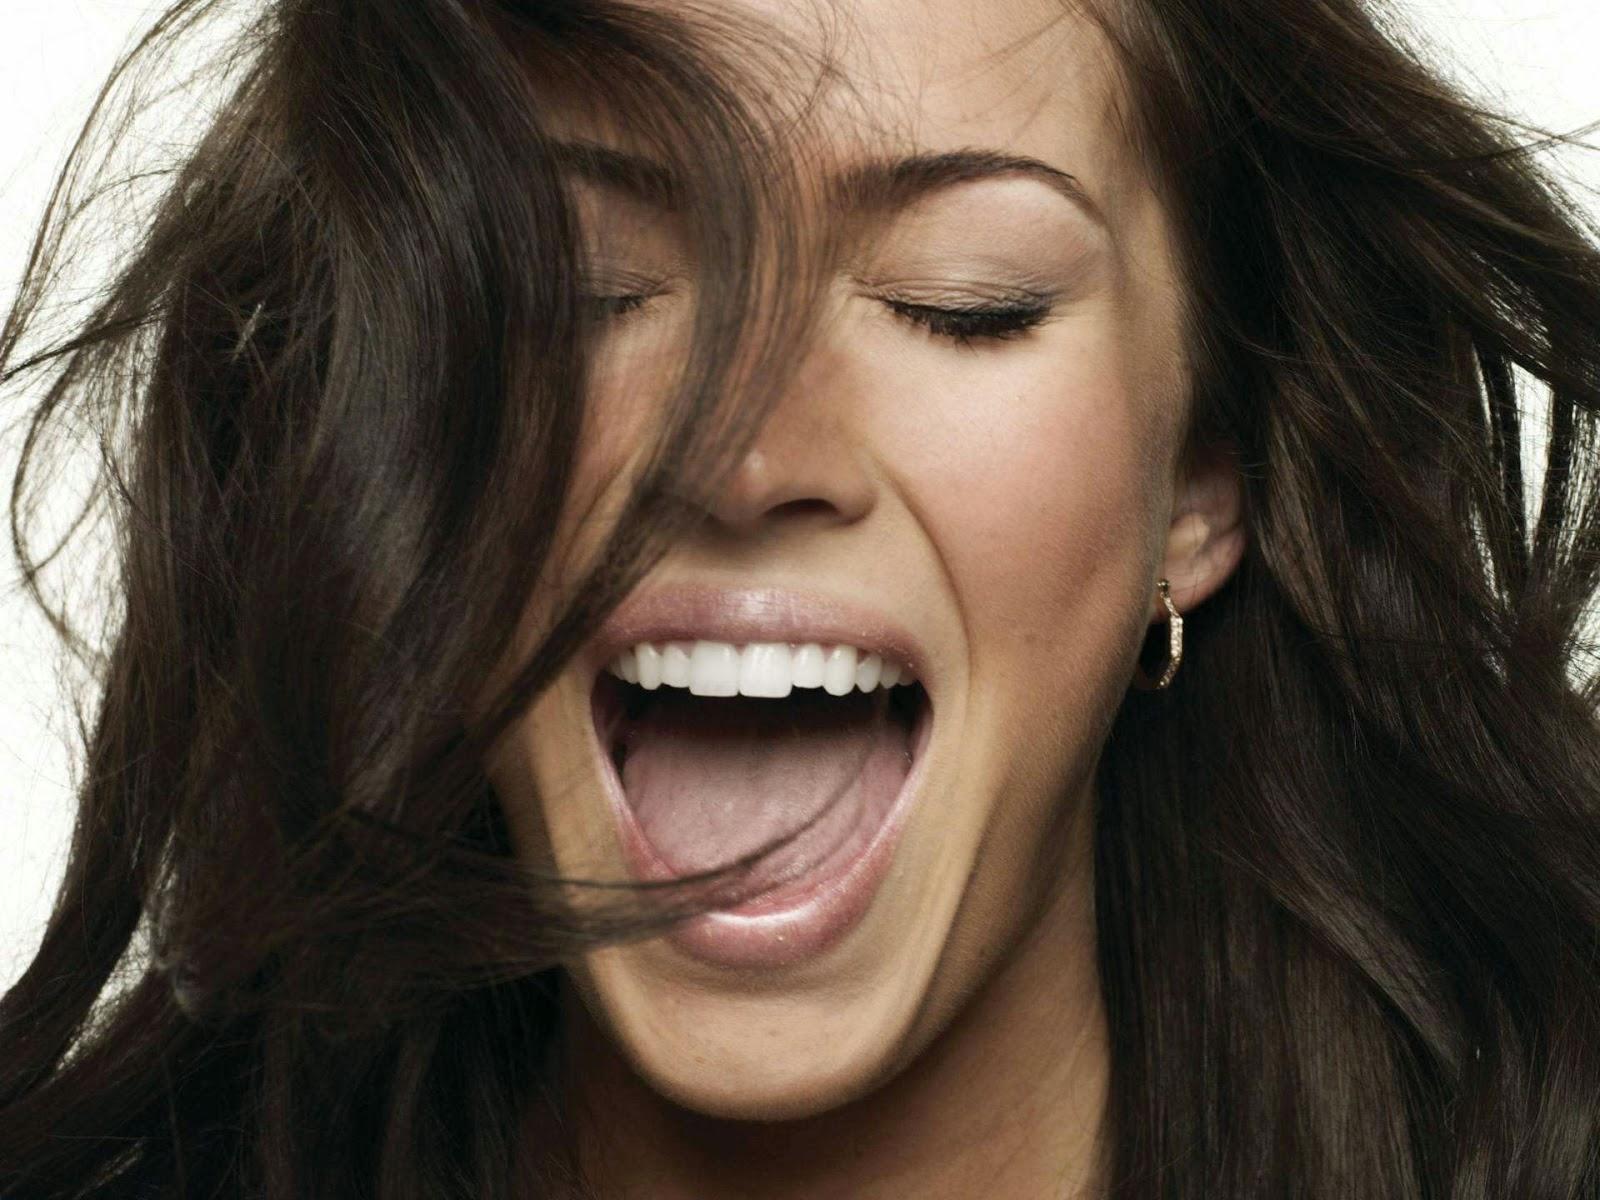 Inilah 7 Keunikan Dari Wanita Yang Membuat Pria Gemas